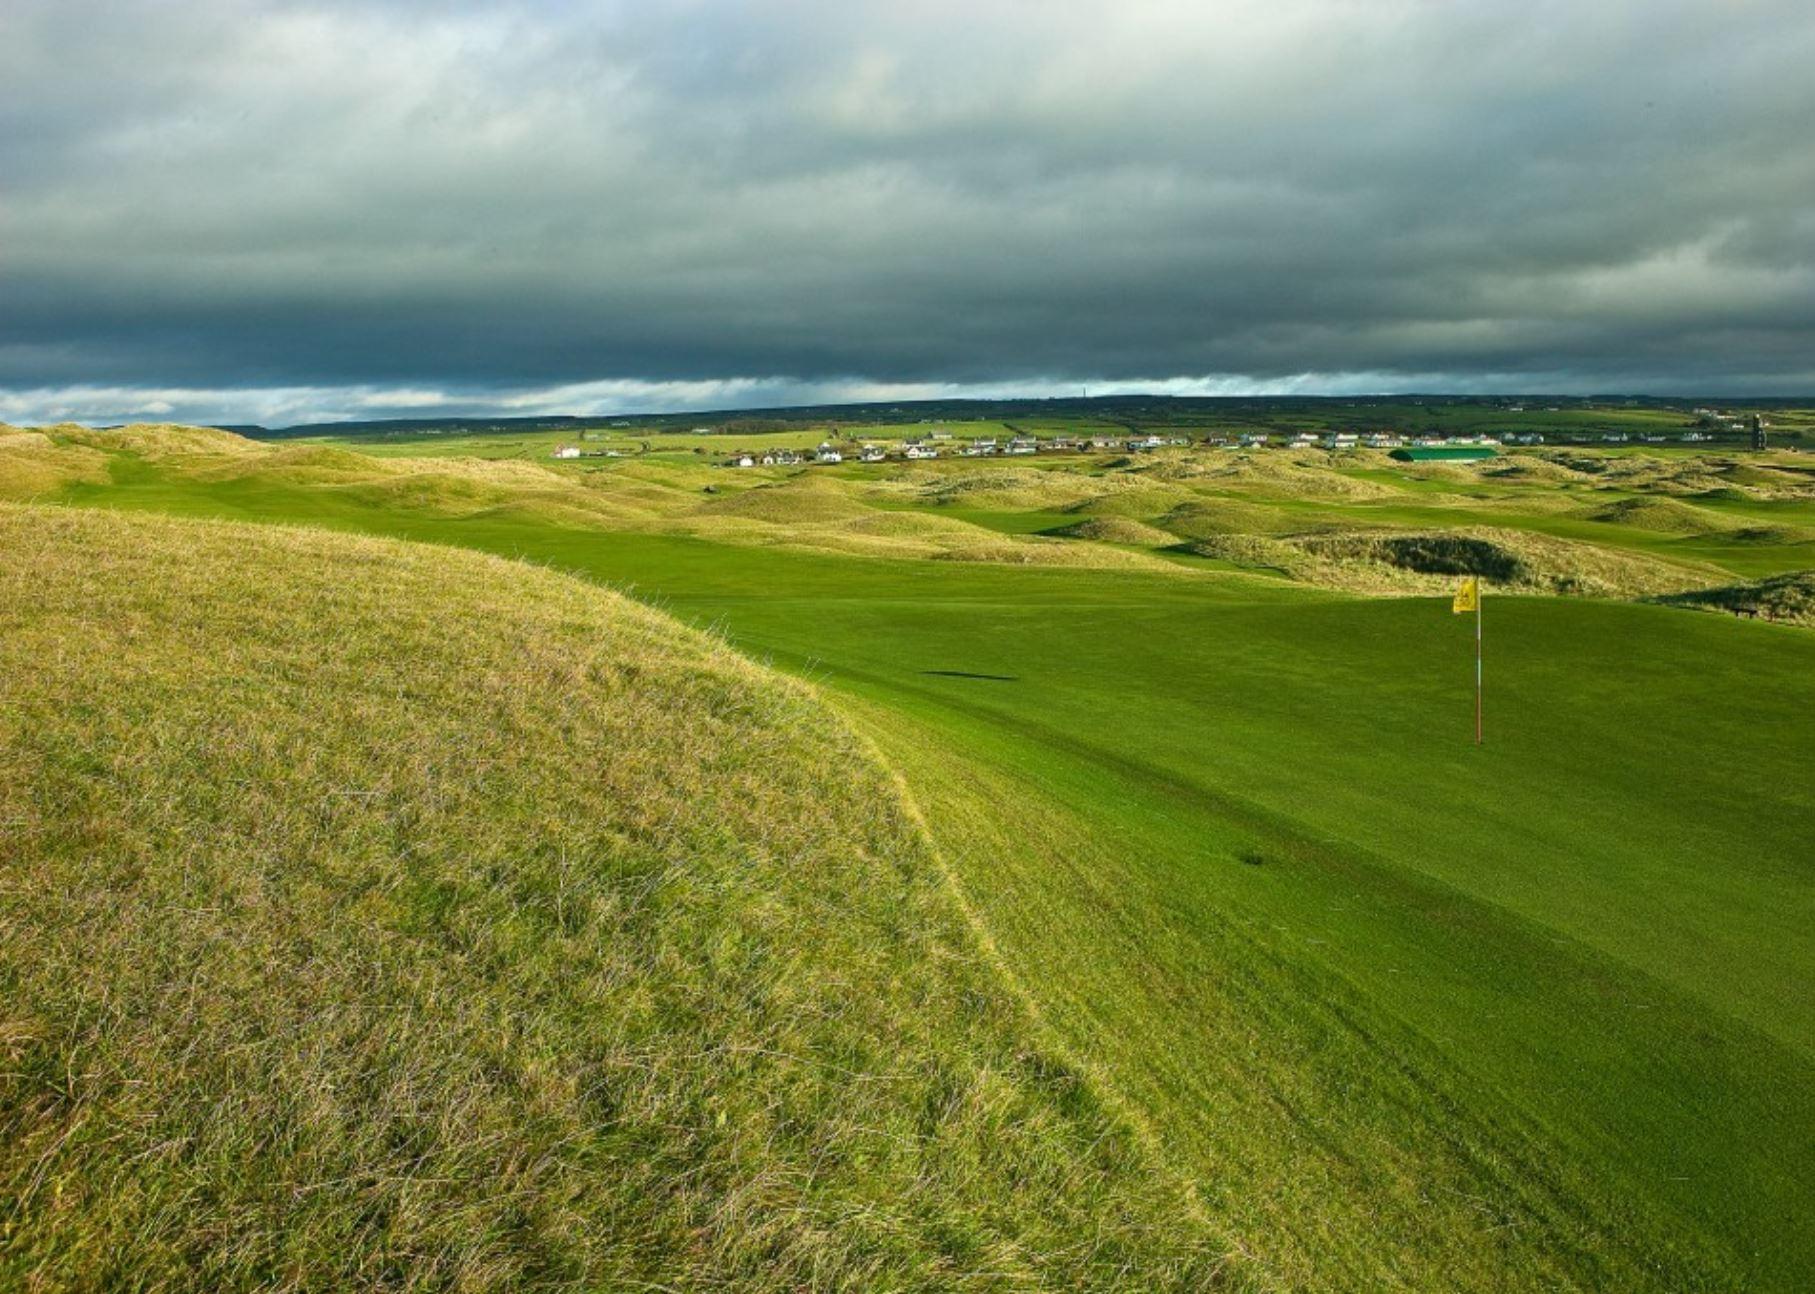 Ireland Golf Vacations - Lahinch, Property of Lahinchgolf.com